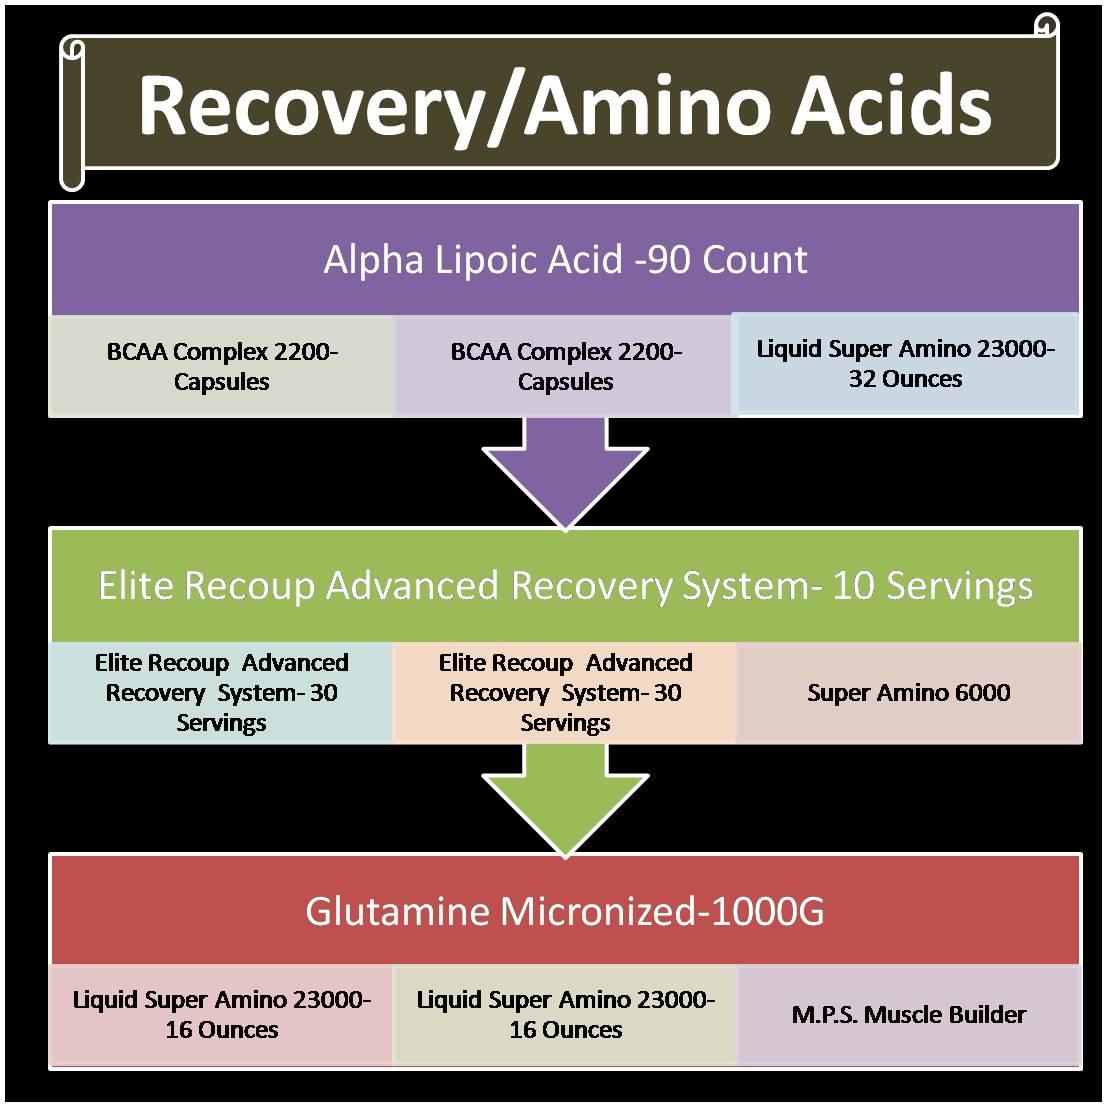 Recovery Amino Acids